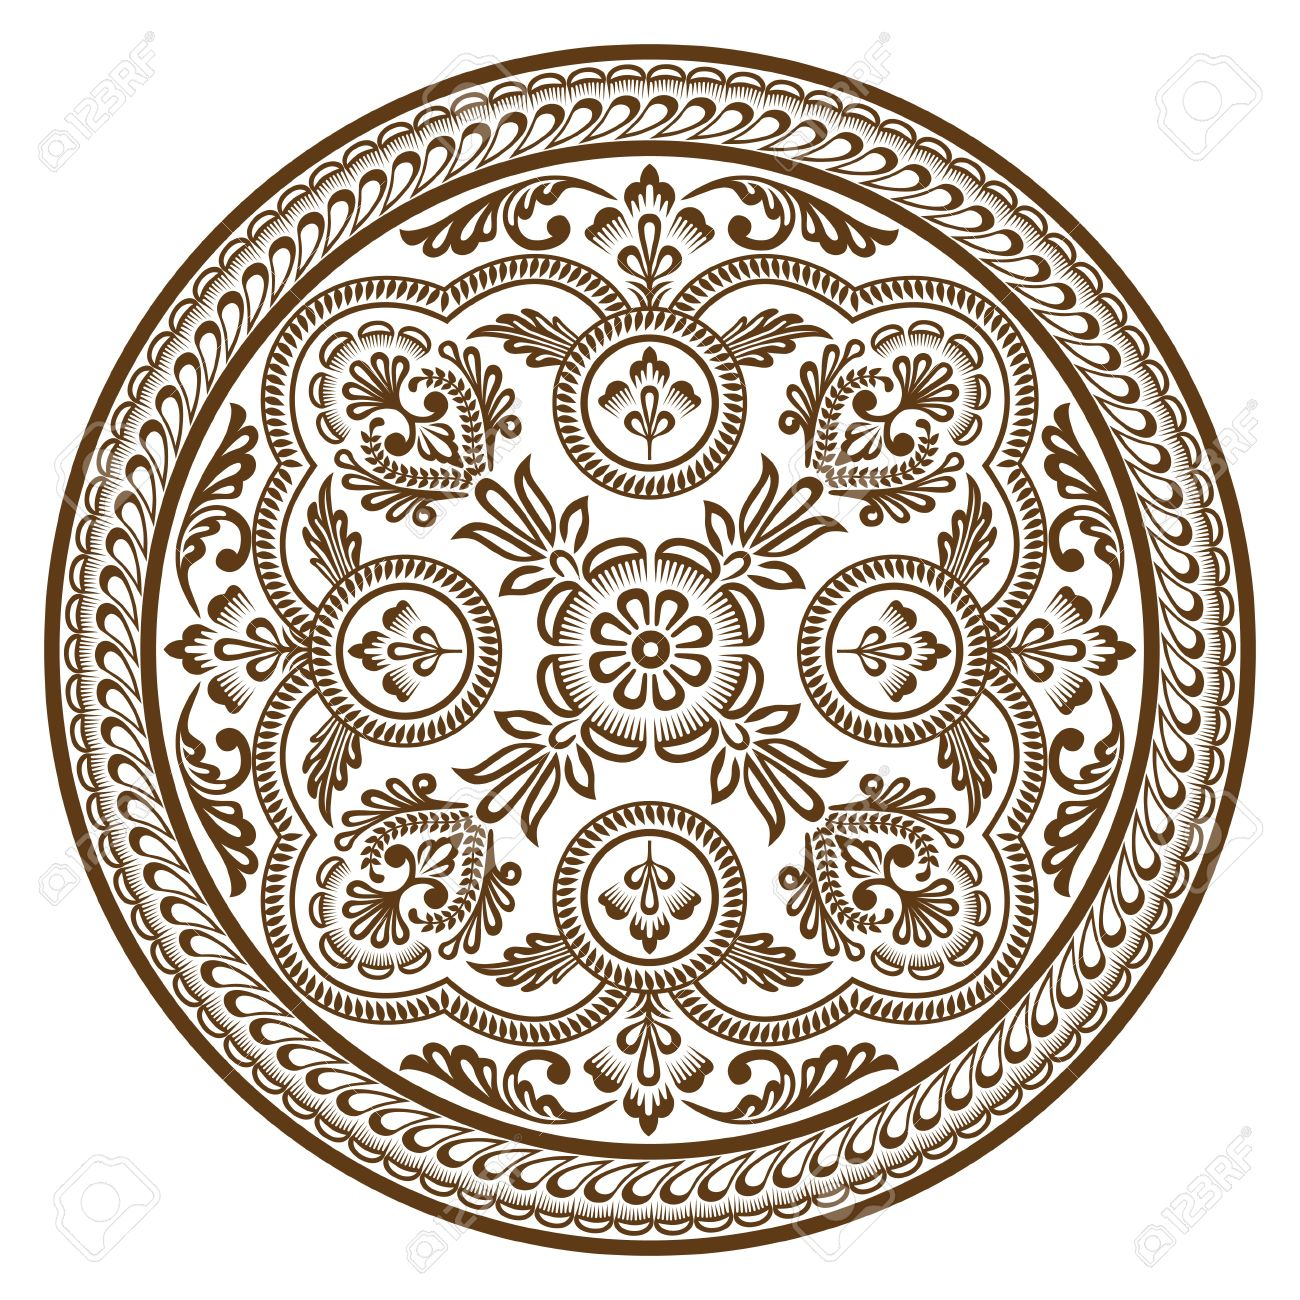 Ornament circle - 14580772